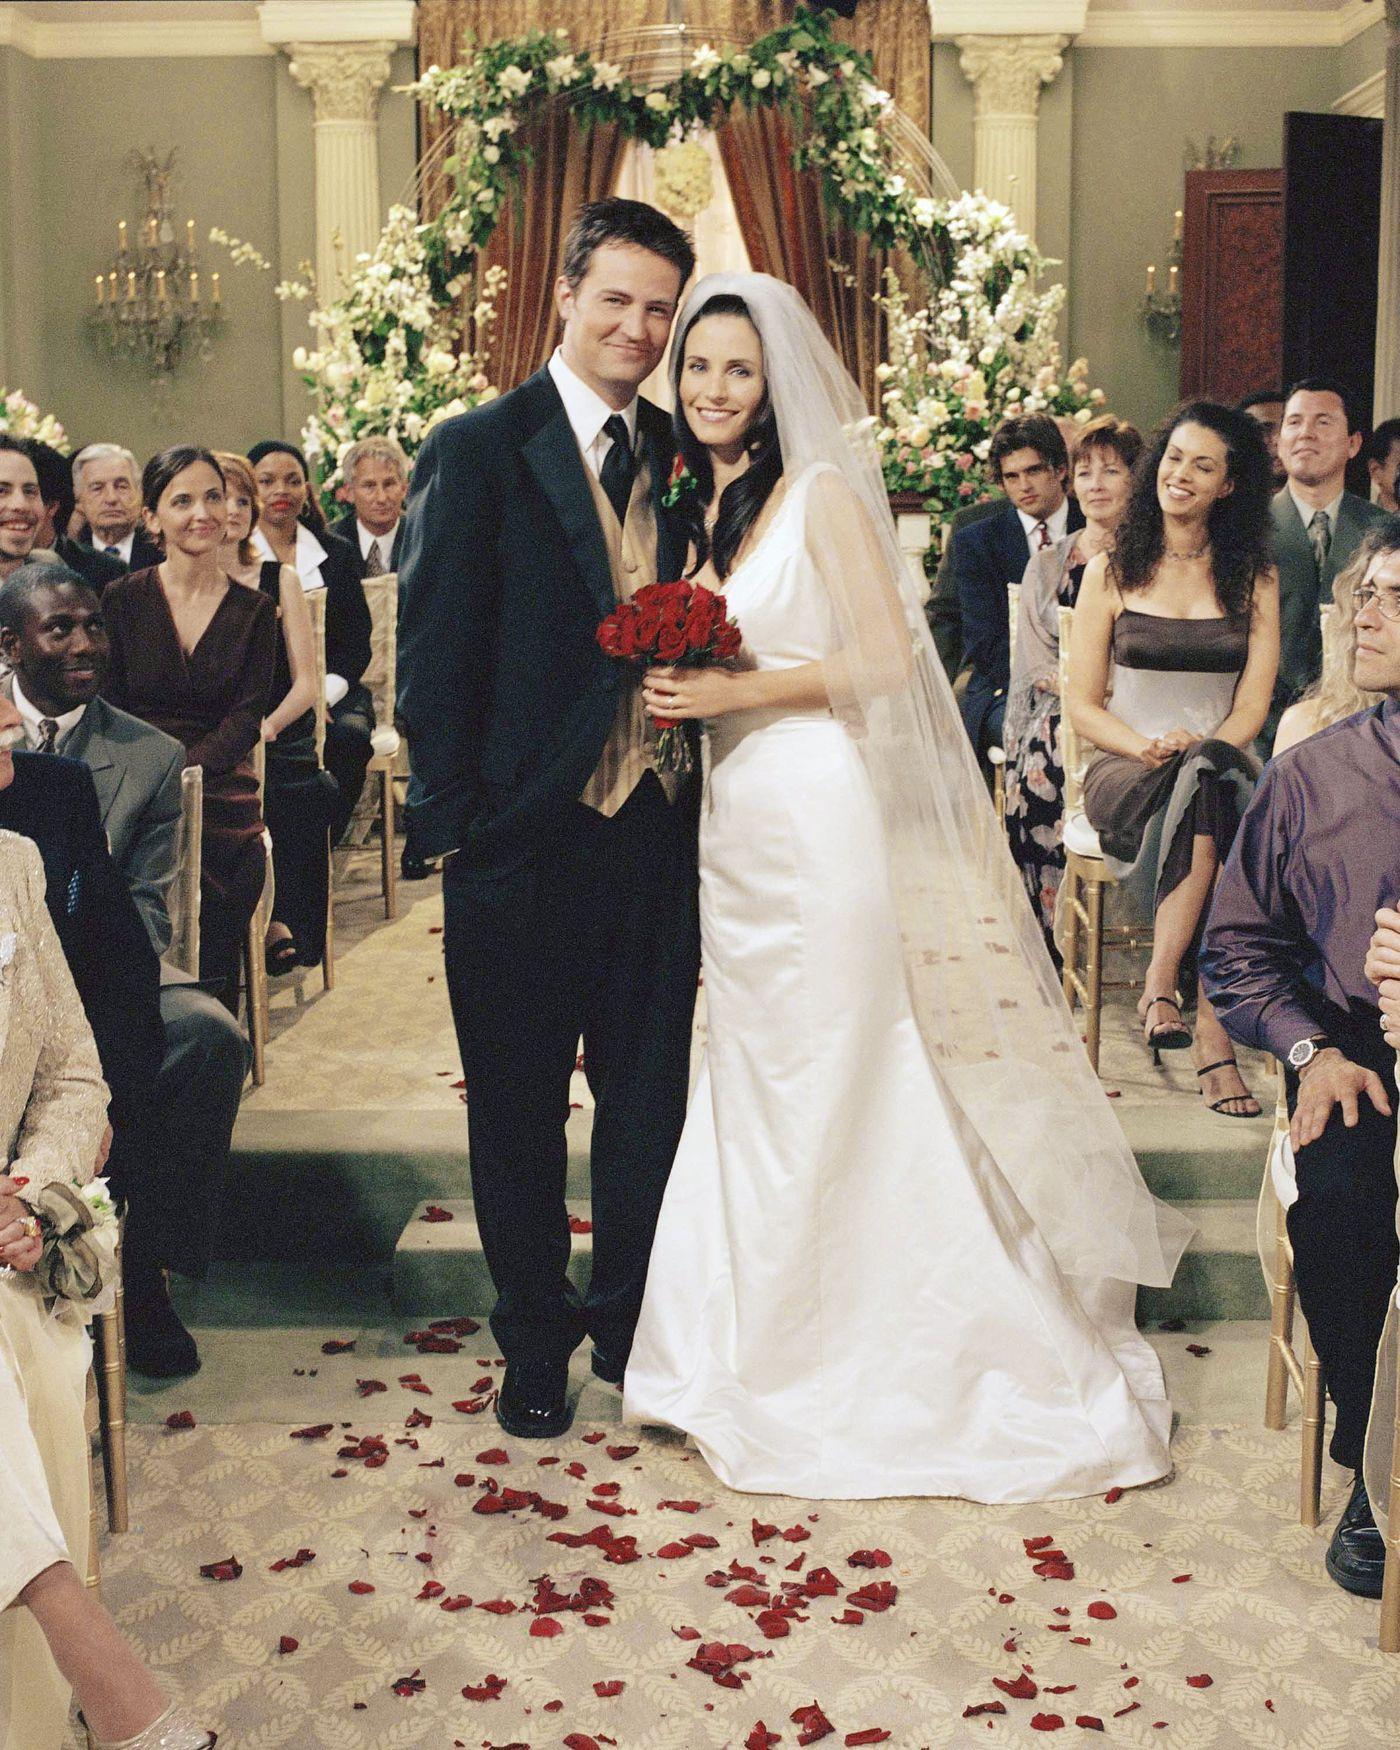 friends_ross_monica_wedding Best Of Friends Monica Wedding Dress @bookmarkpages.info